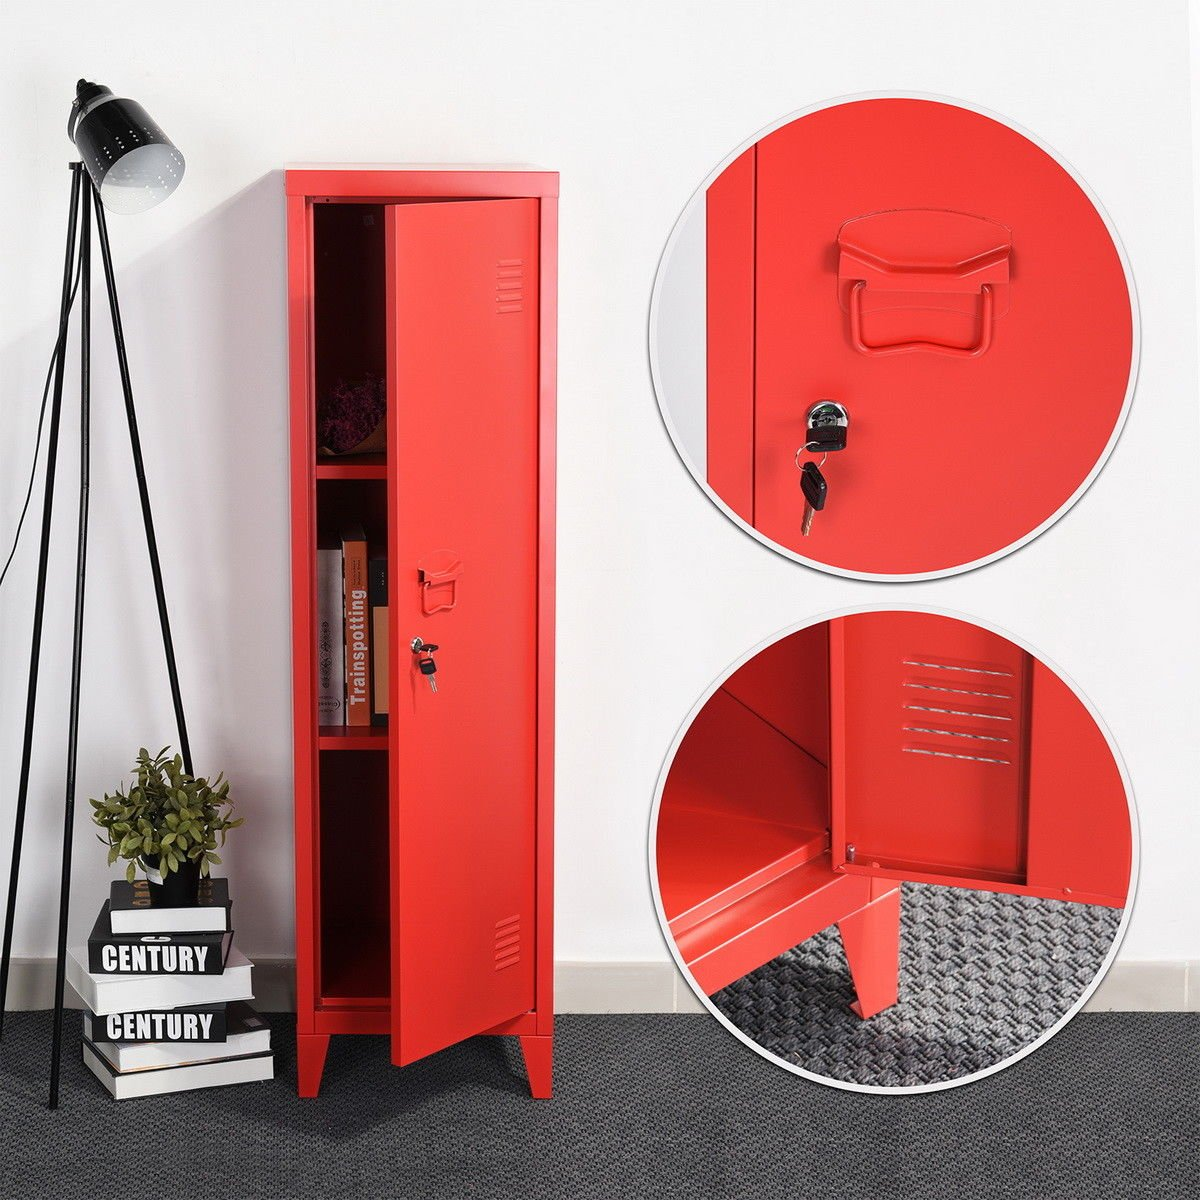 HouseinBox Office File Storage Metal Cabinet 3 Door Cupboard Locker Organizer Console Stand 3-in-1 (RED-Standing Locker) by HouseinBox (Image #3)